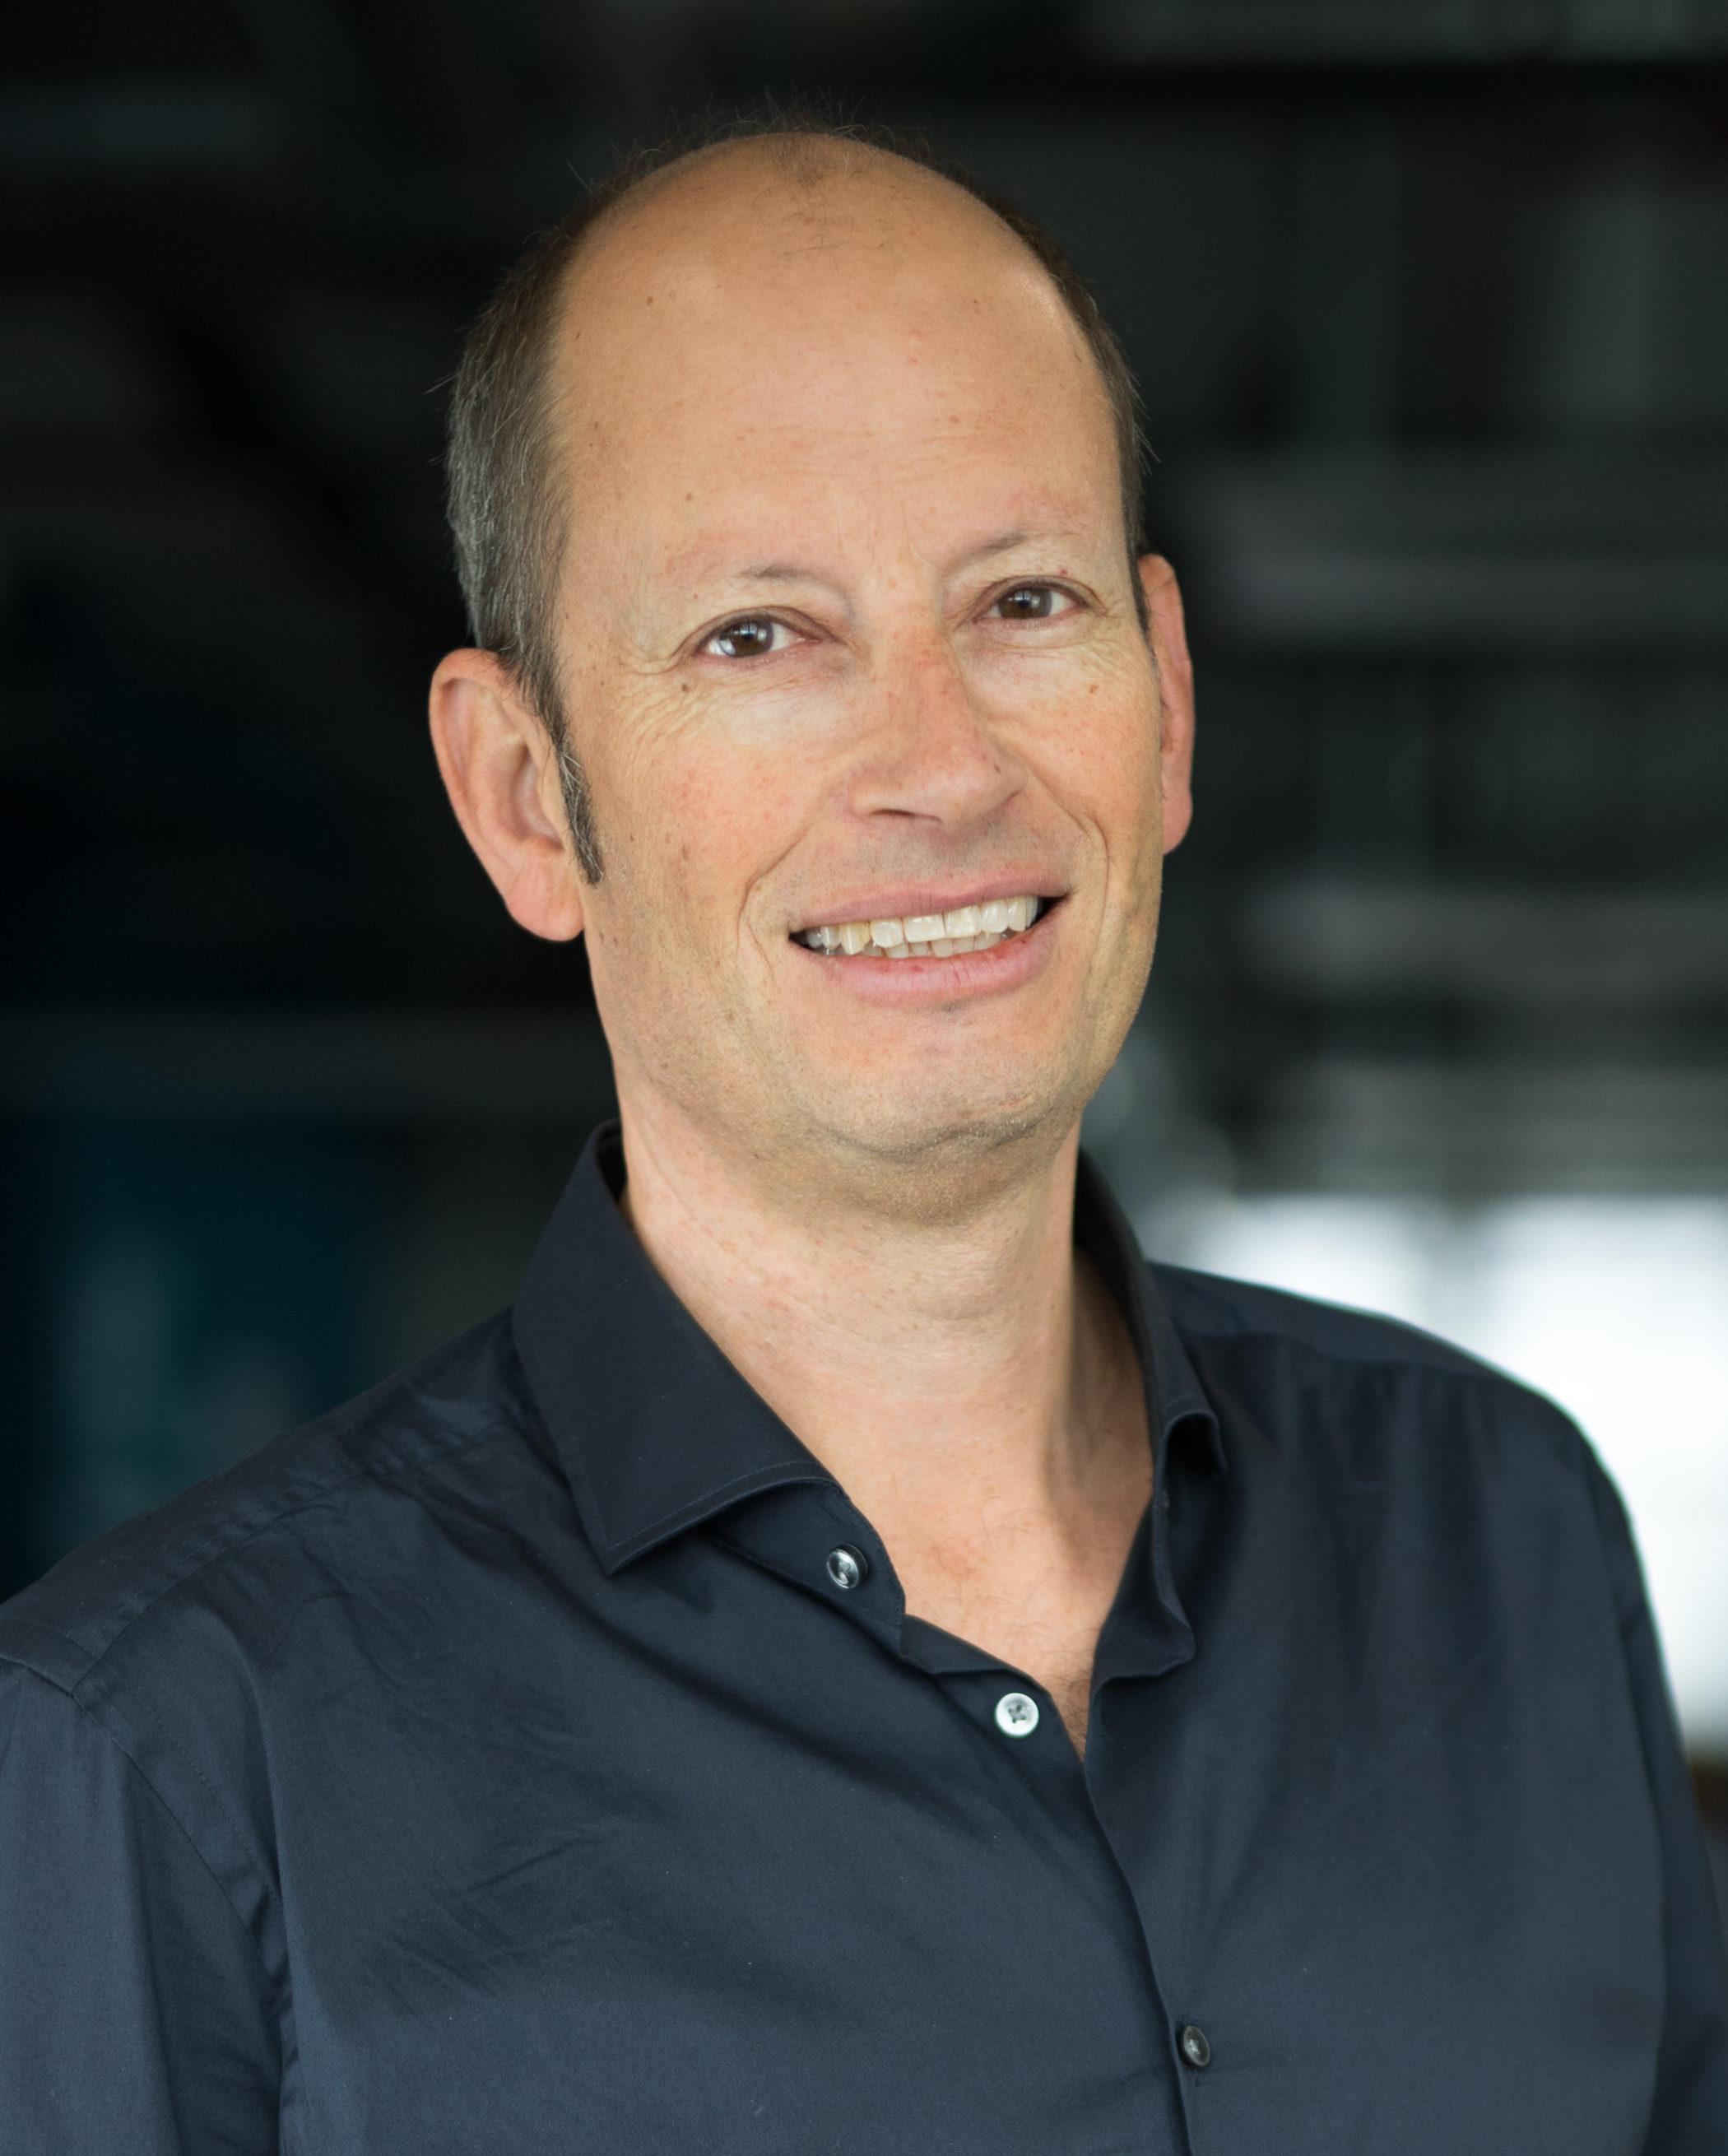 Prof. Patrick Schoettker